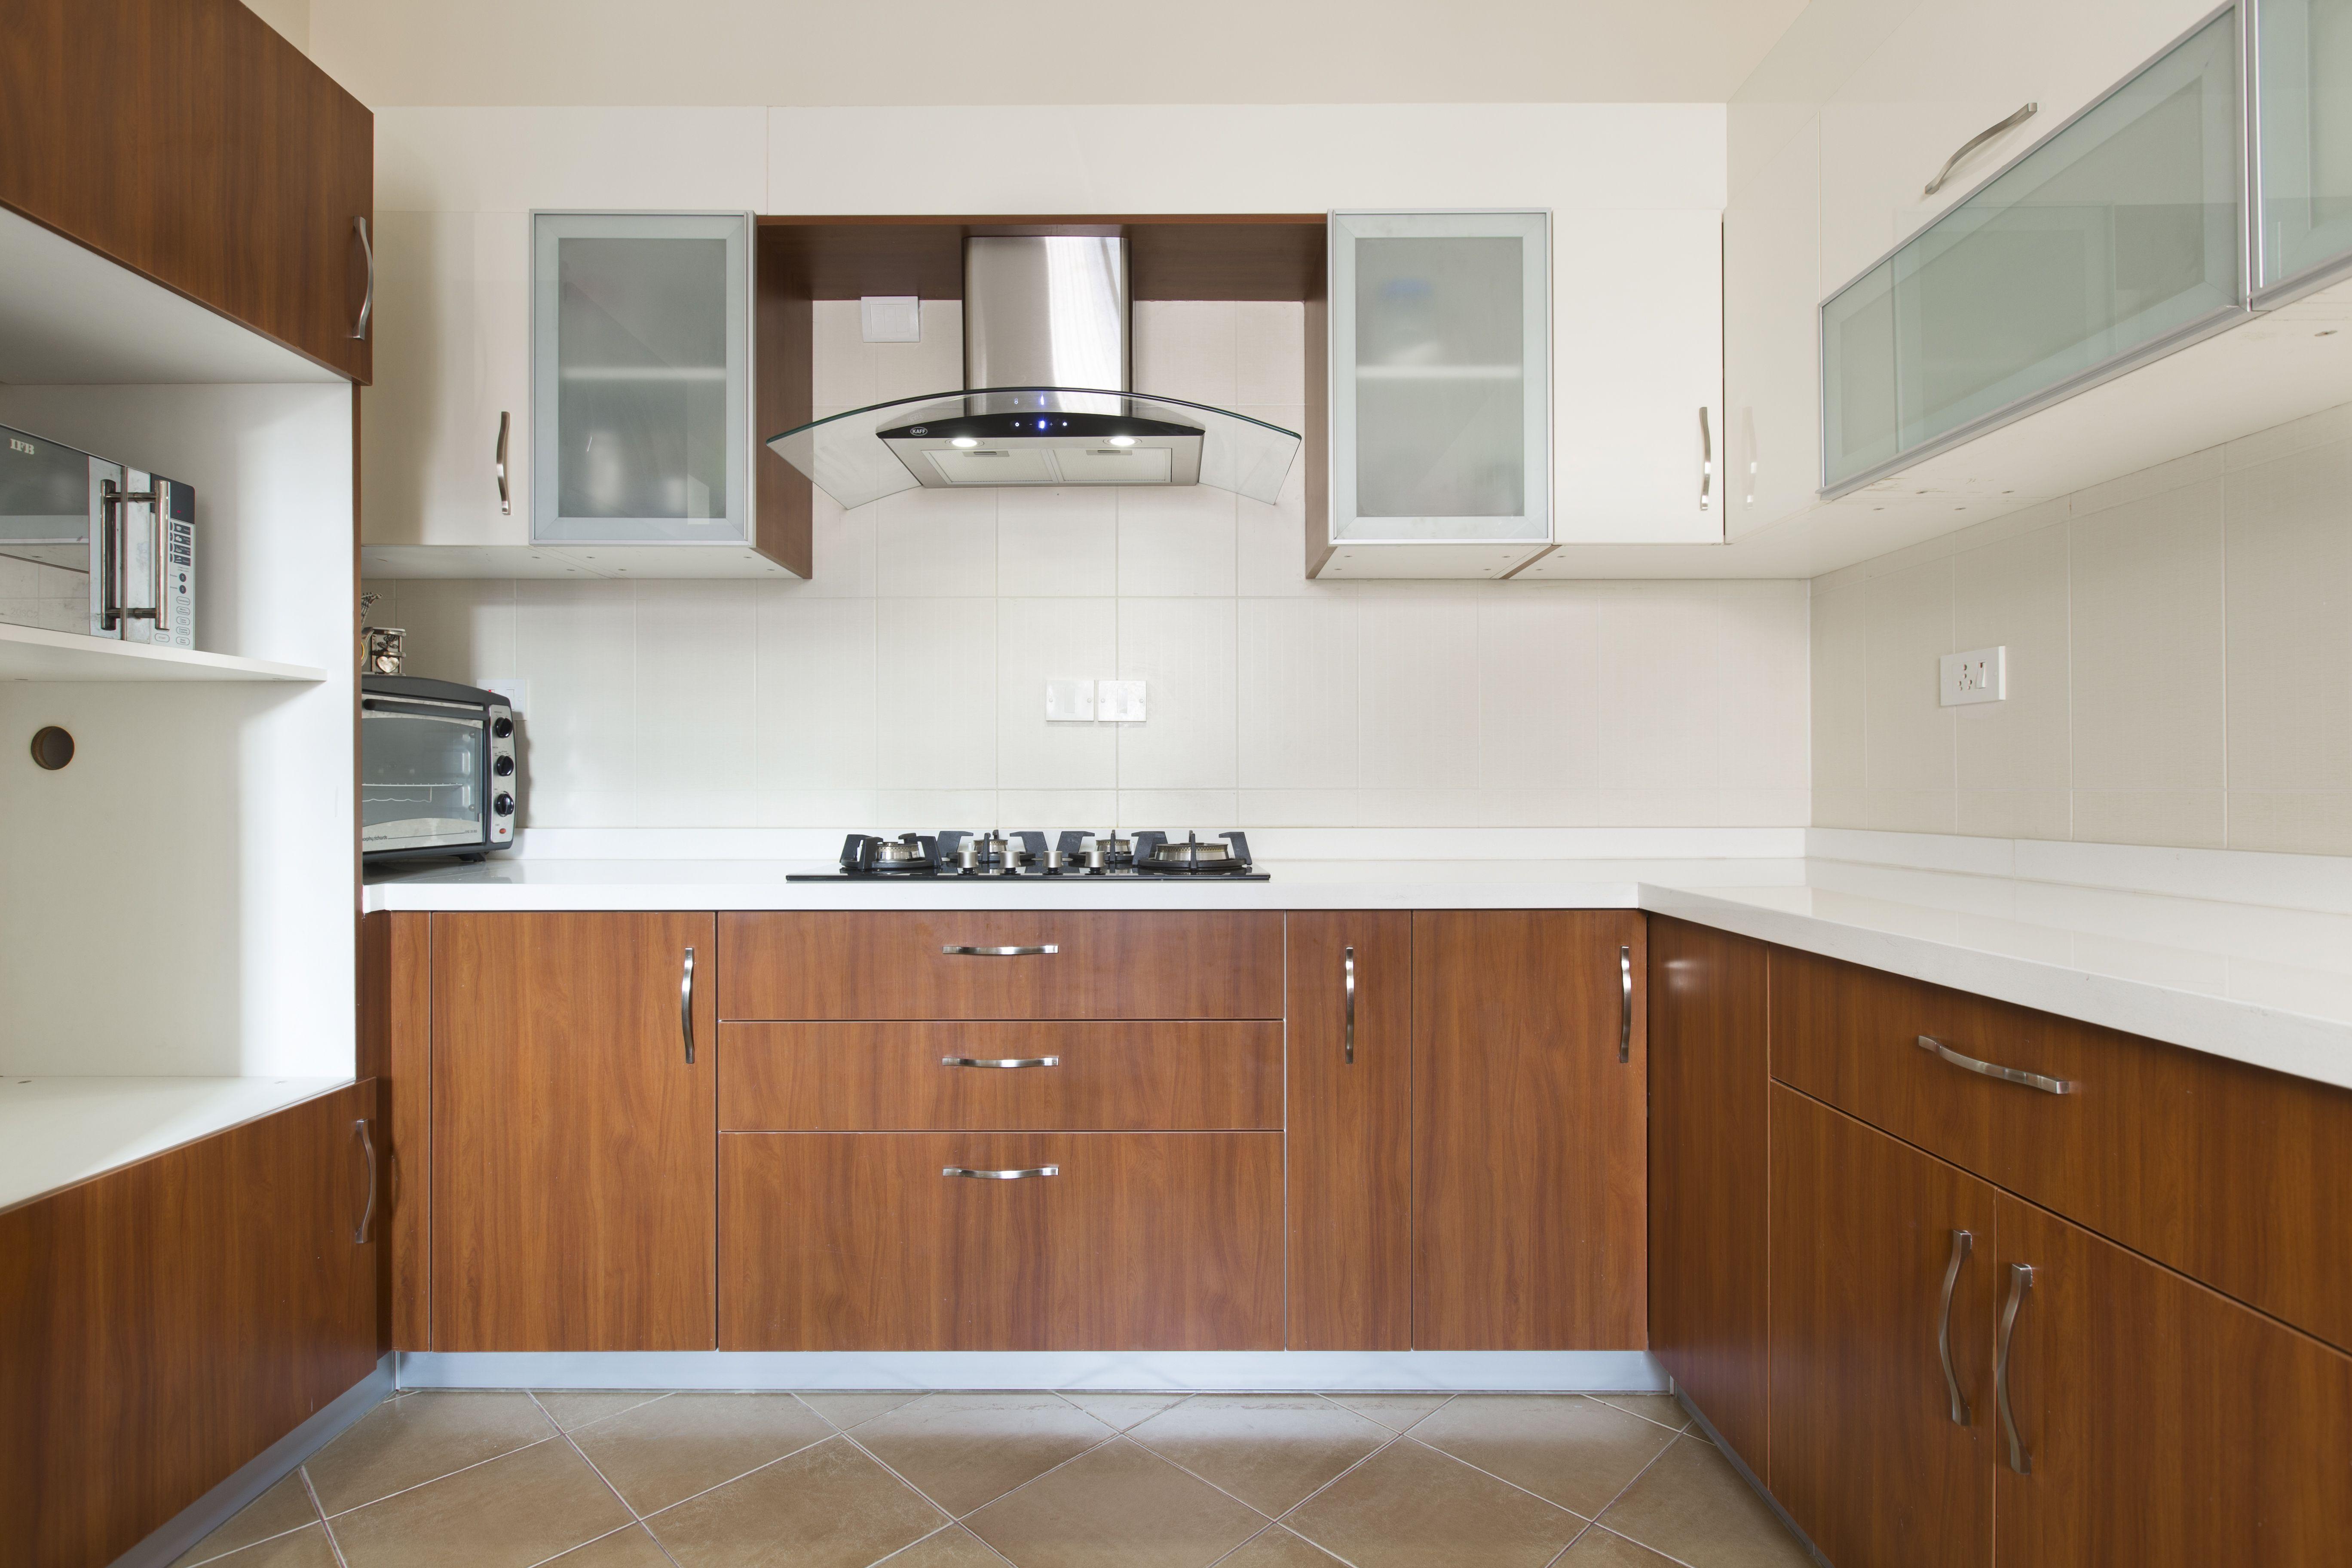 U Shaped Modular Kitchens From Homelane Com Glass Kitchen Cabinet Doors Kitchen Cabinets Glass Kitchen Cabinets